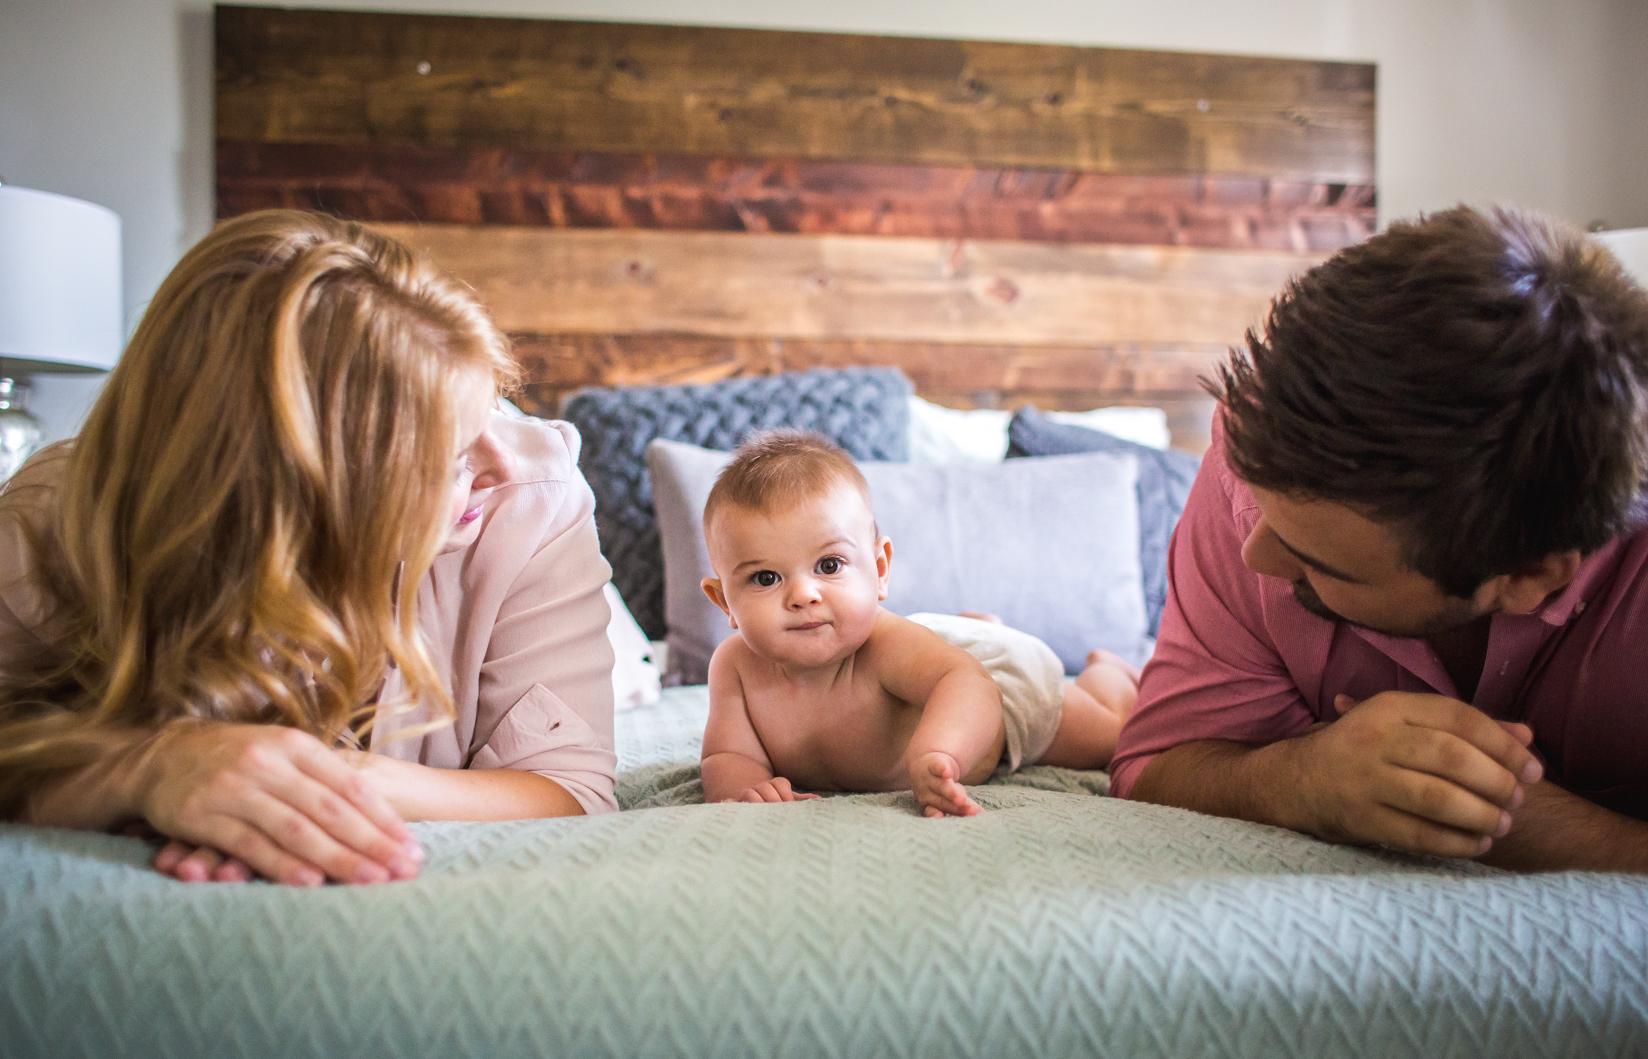 boca-raton-family-photographer-delray-beach-lifestyle-newborn-baby-home-photo-shoot-session-5.jpg